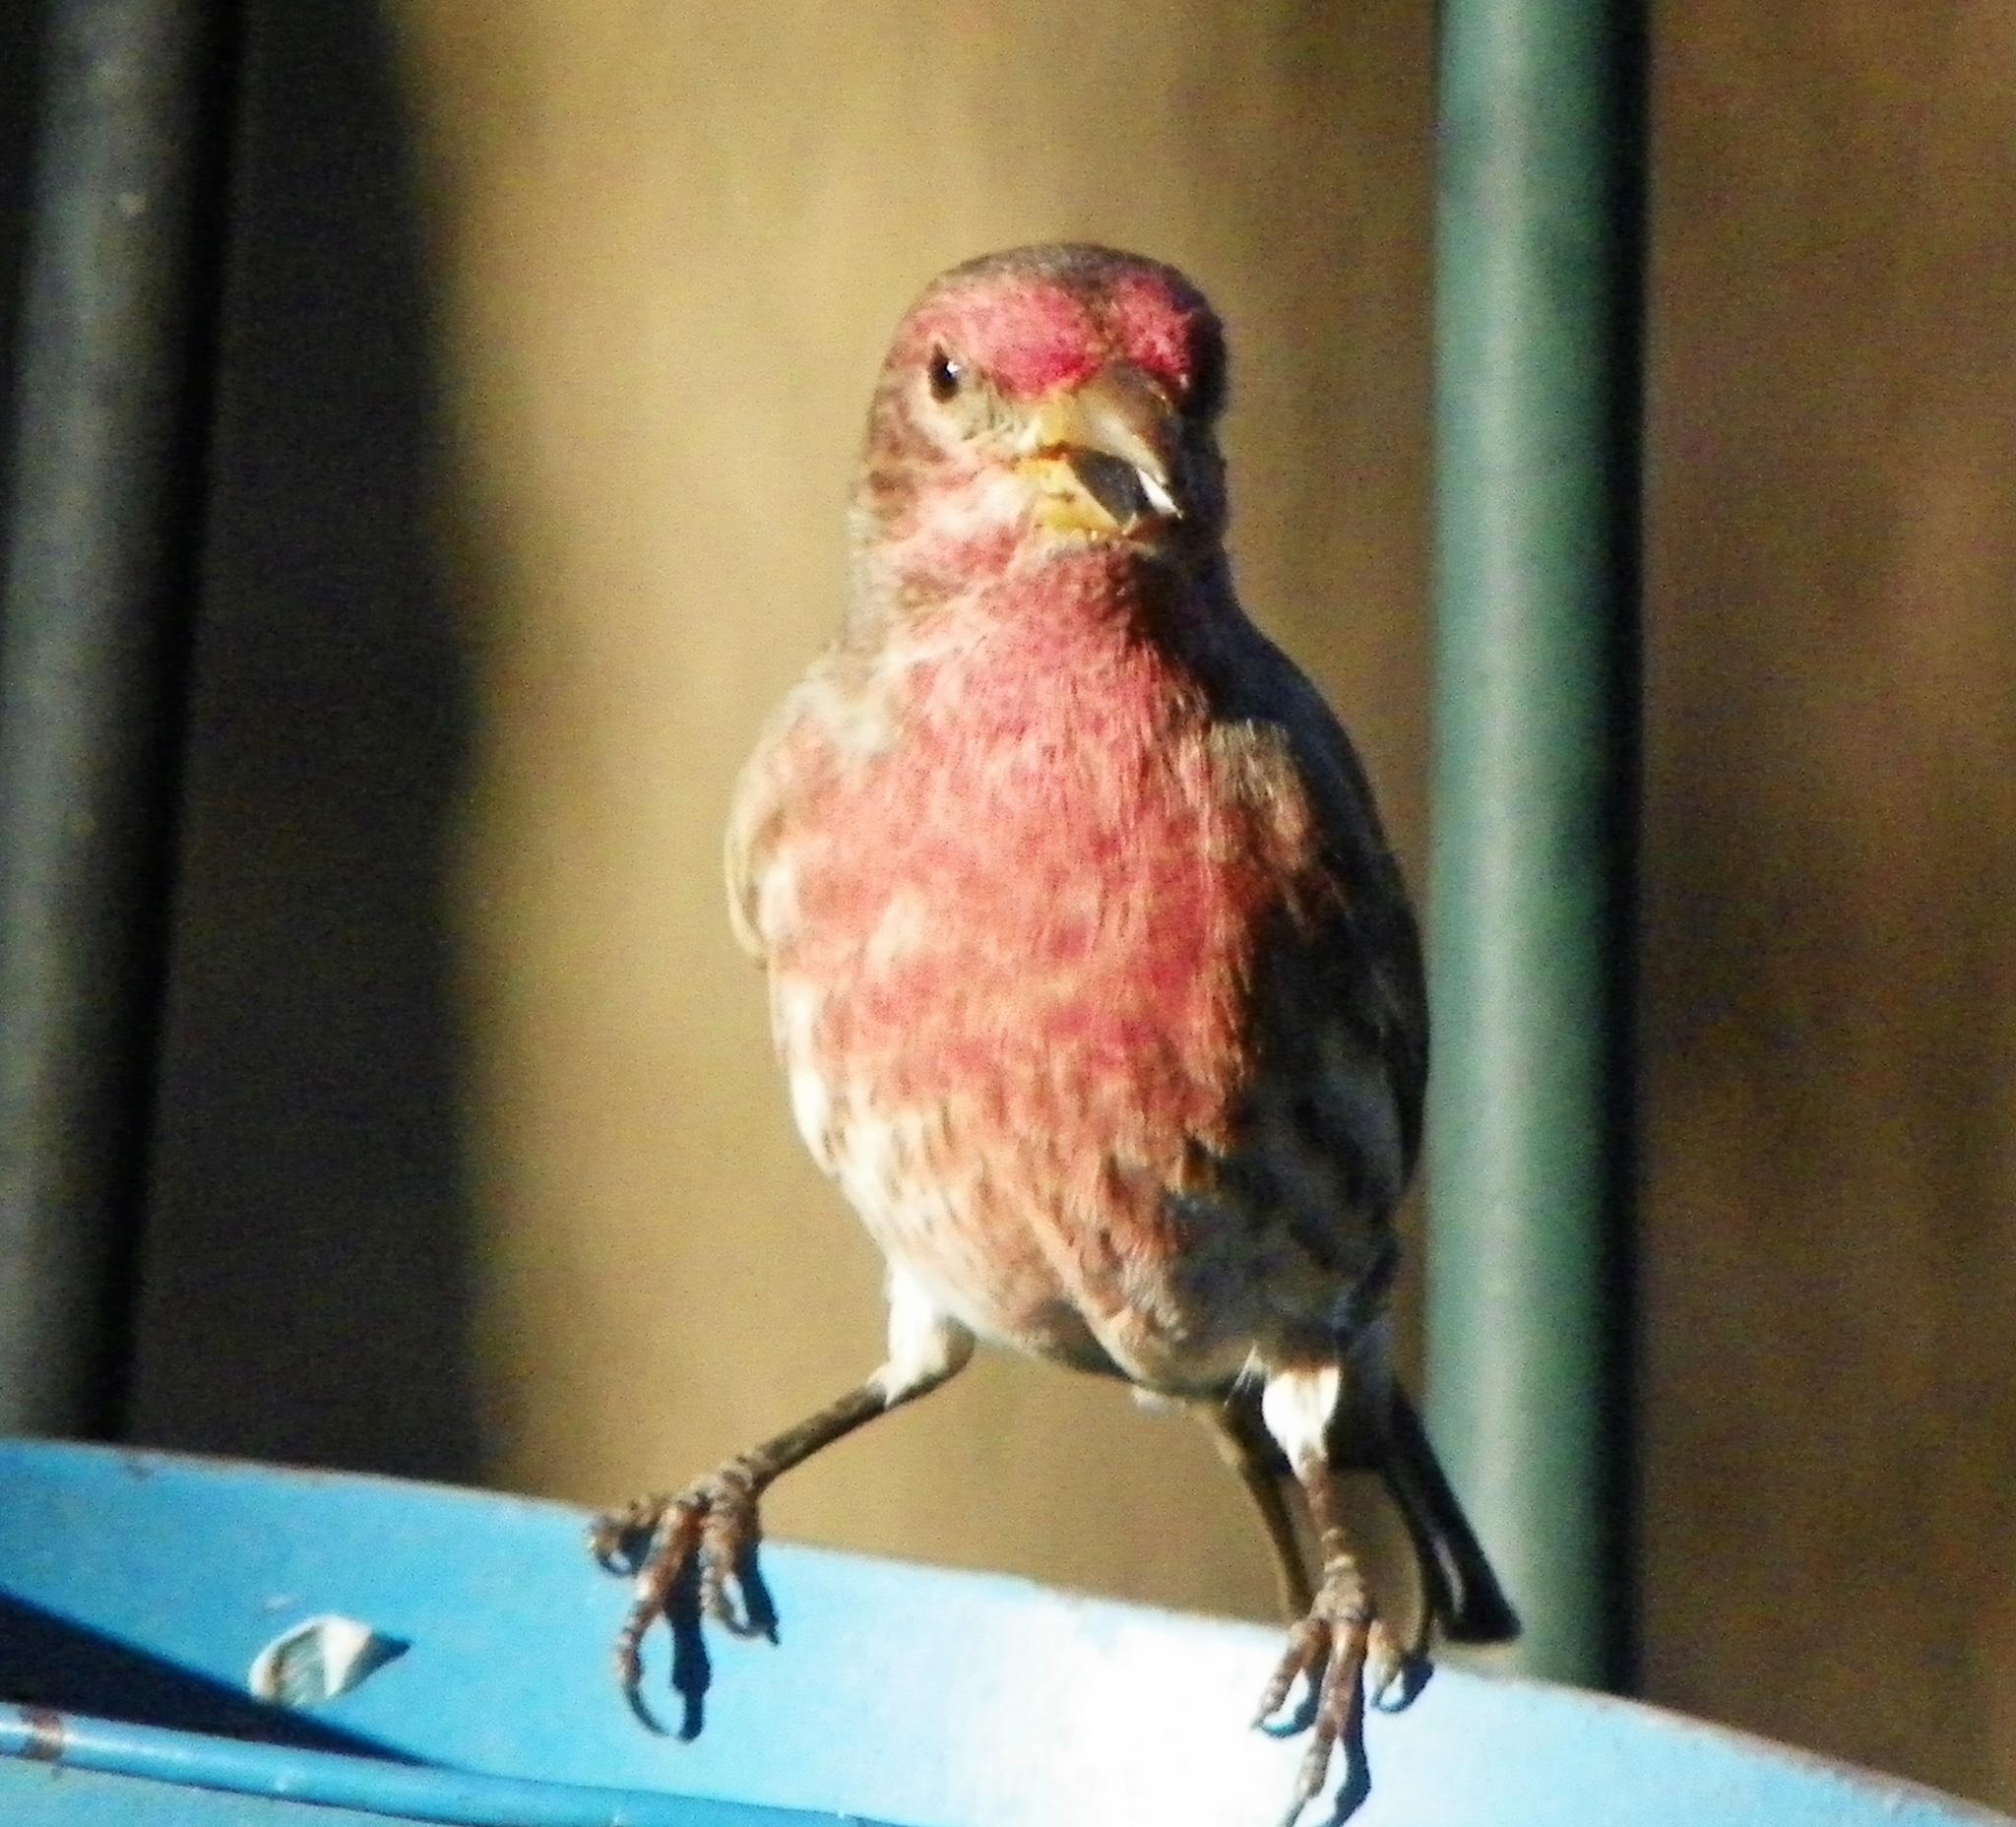 A seed in the Beak by ssmjdd